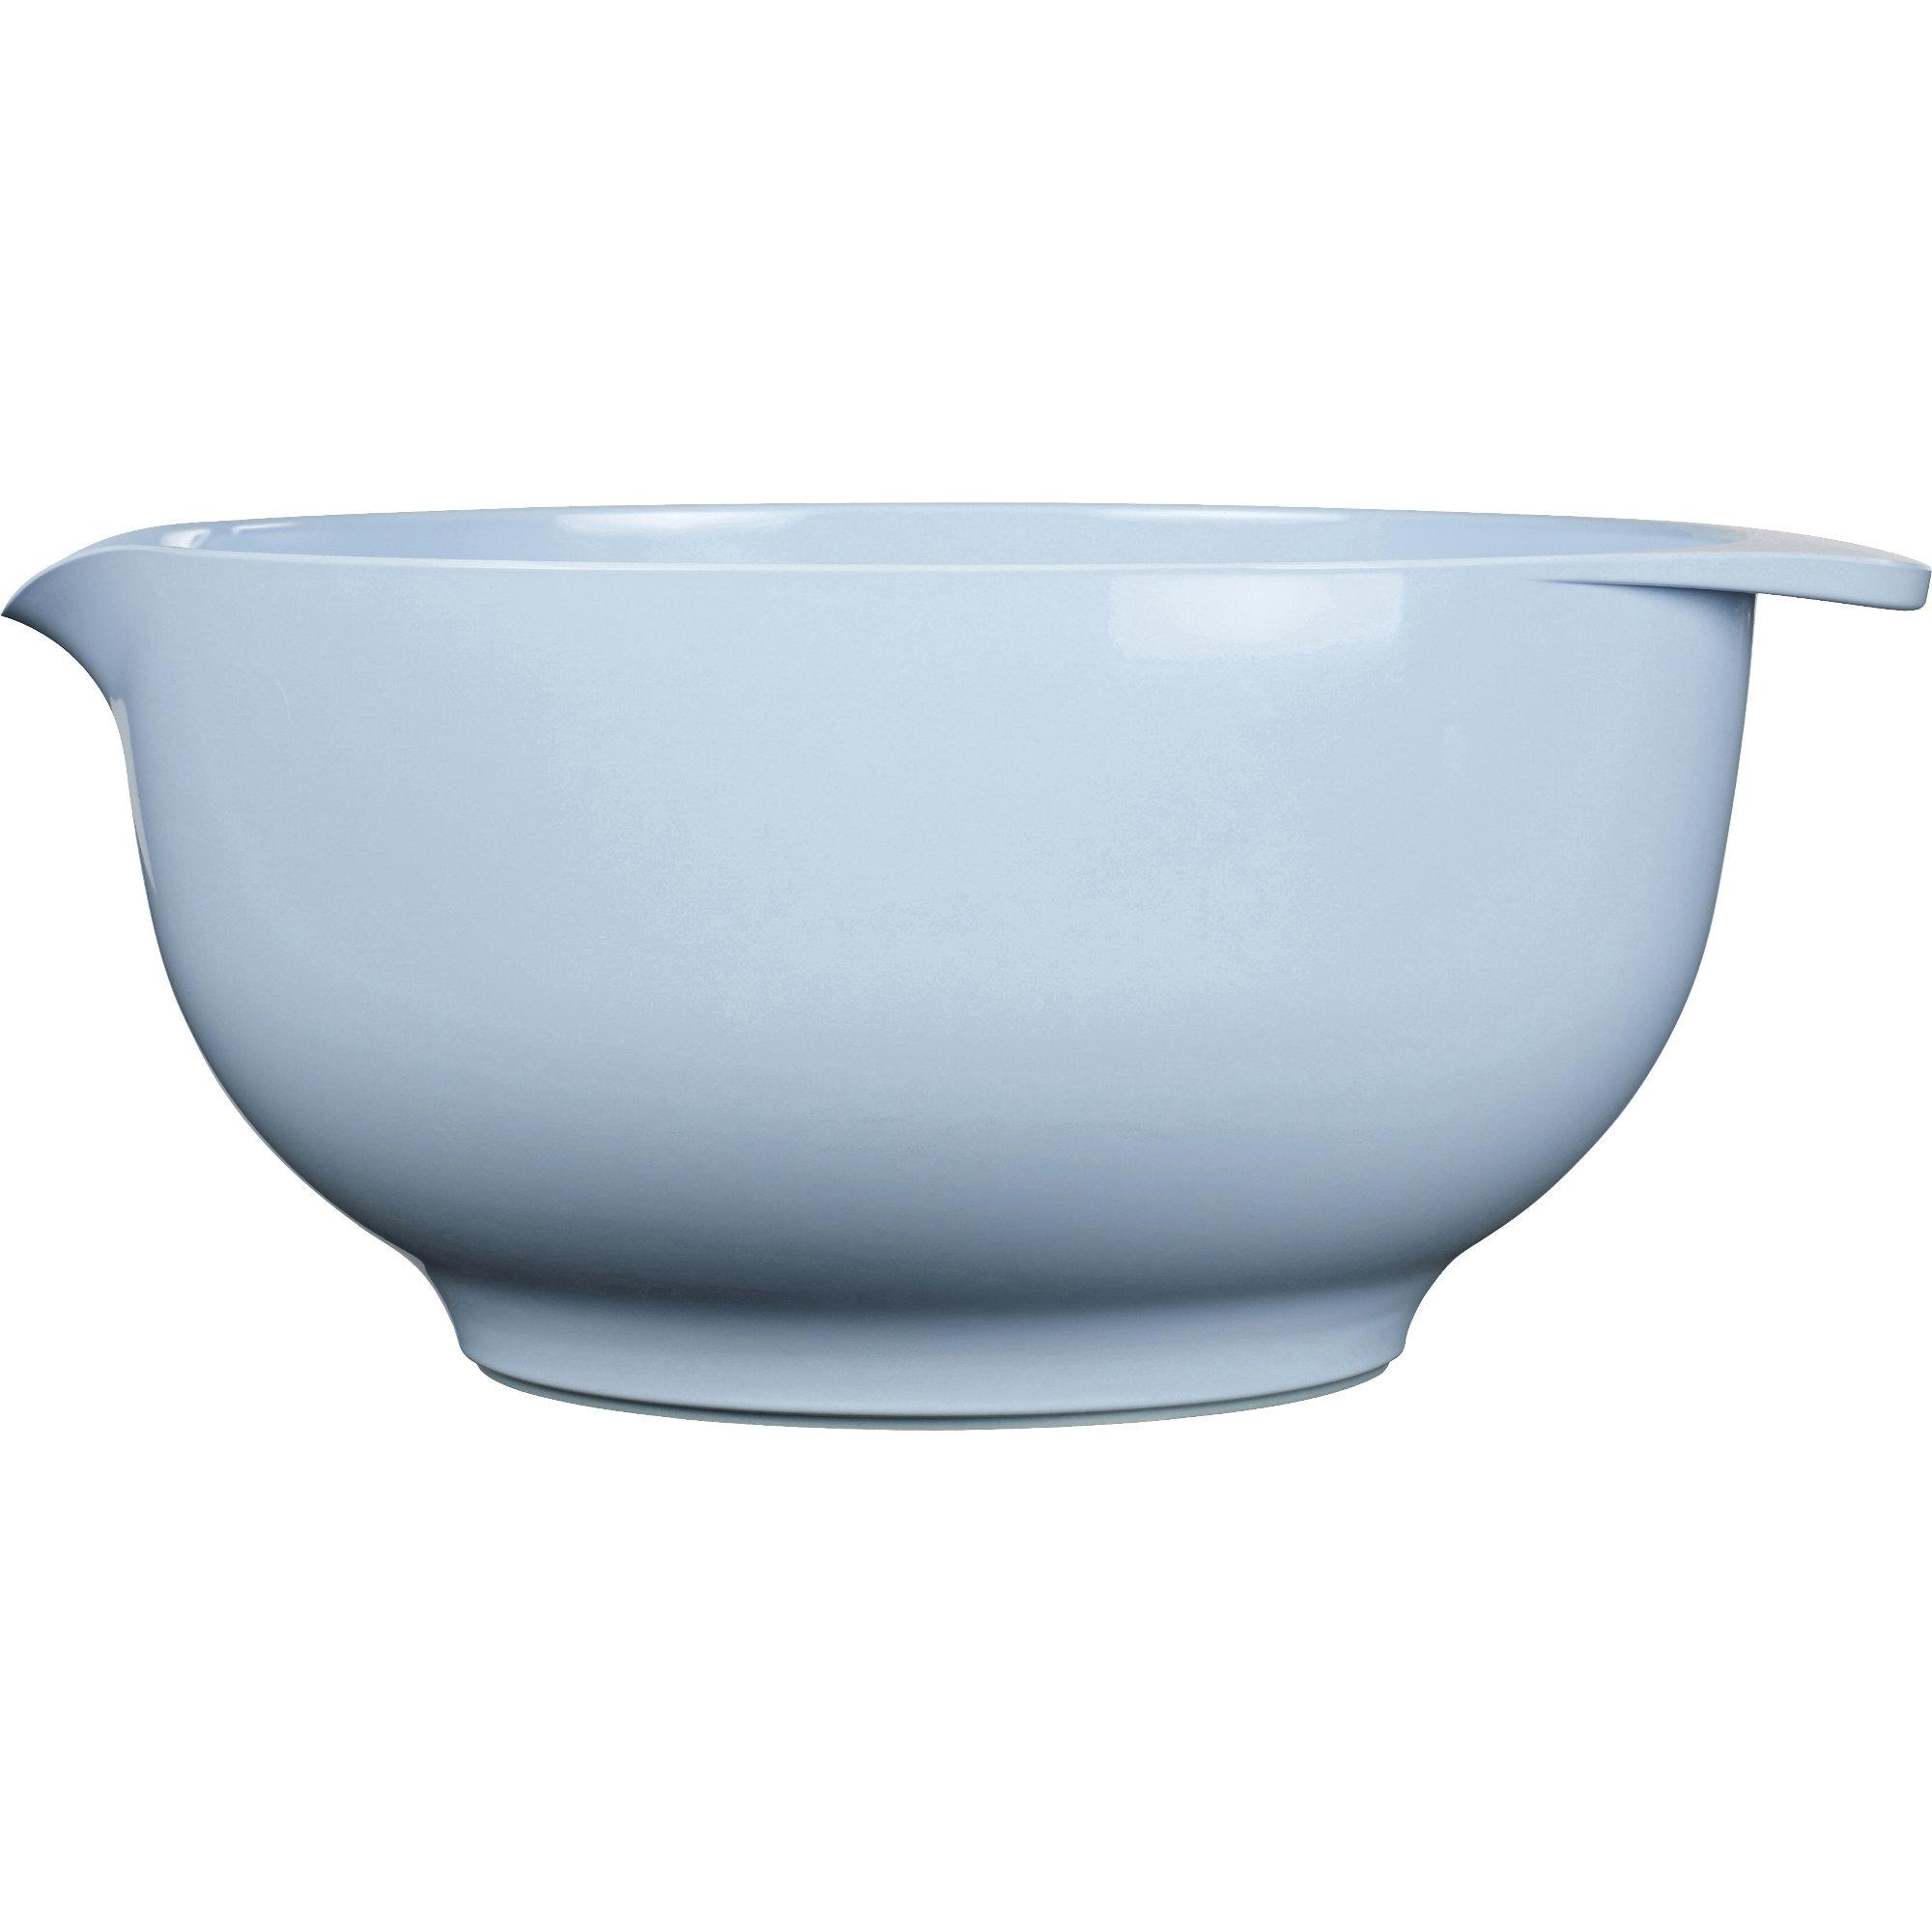 Rosti Mepal Margrethe Skål 5 L Nordic Blue